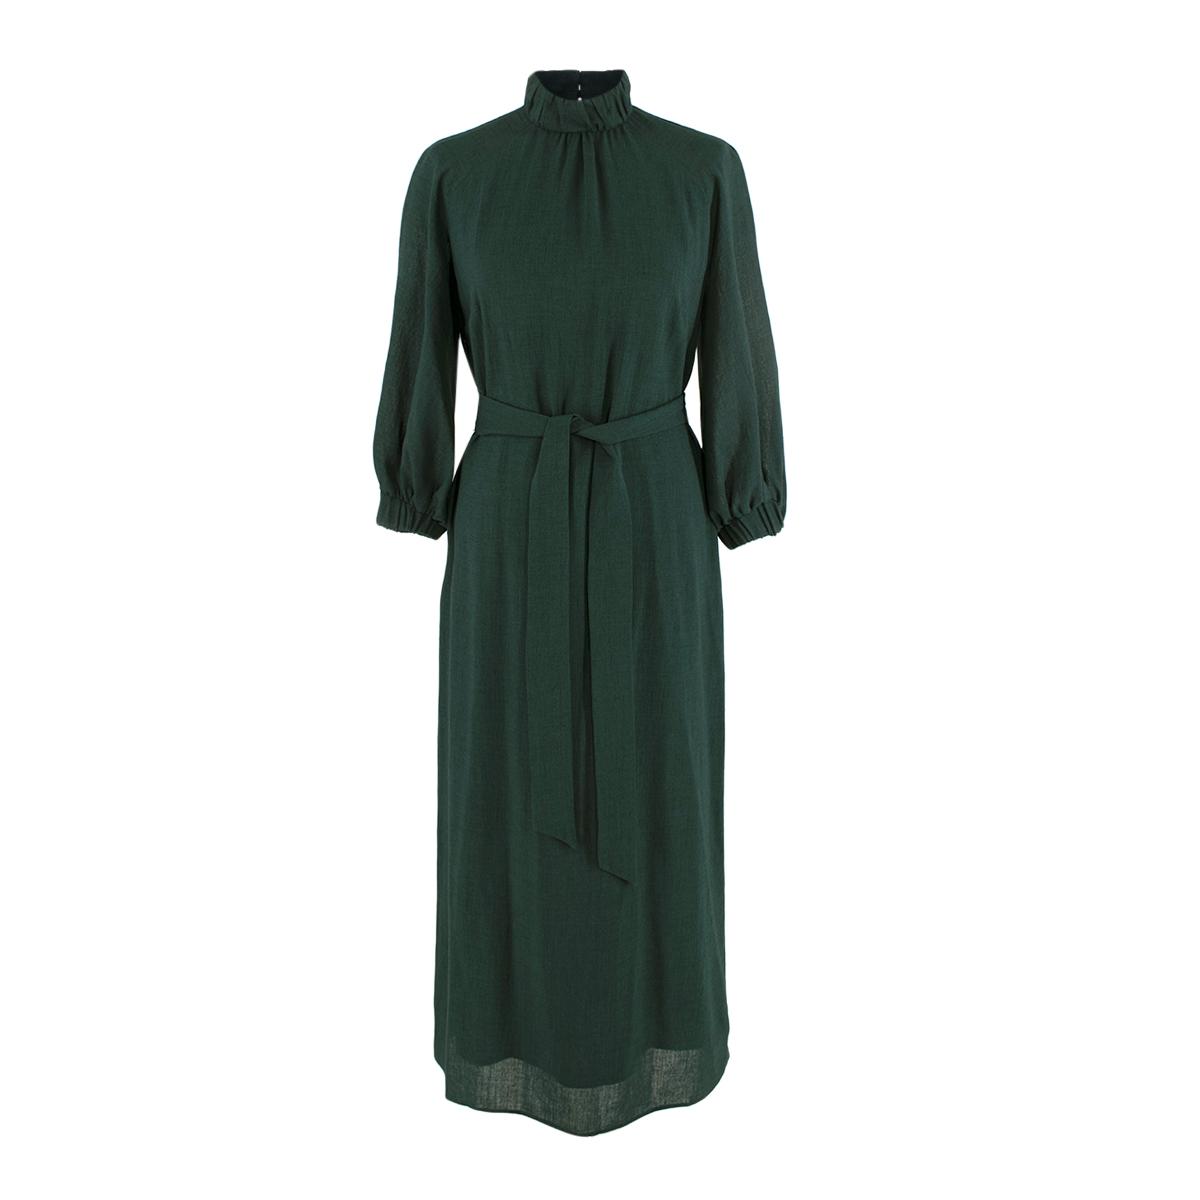 Cefinn High Neck Dark Green Tie-Waist Dress